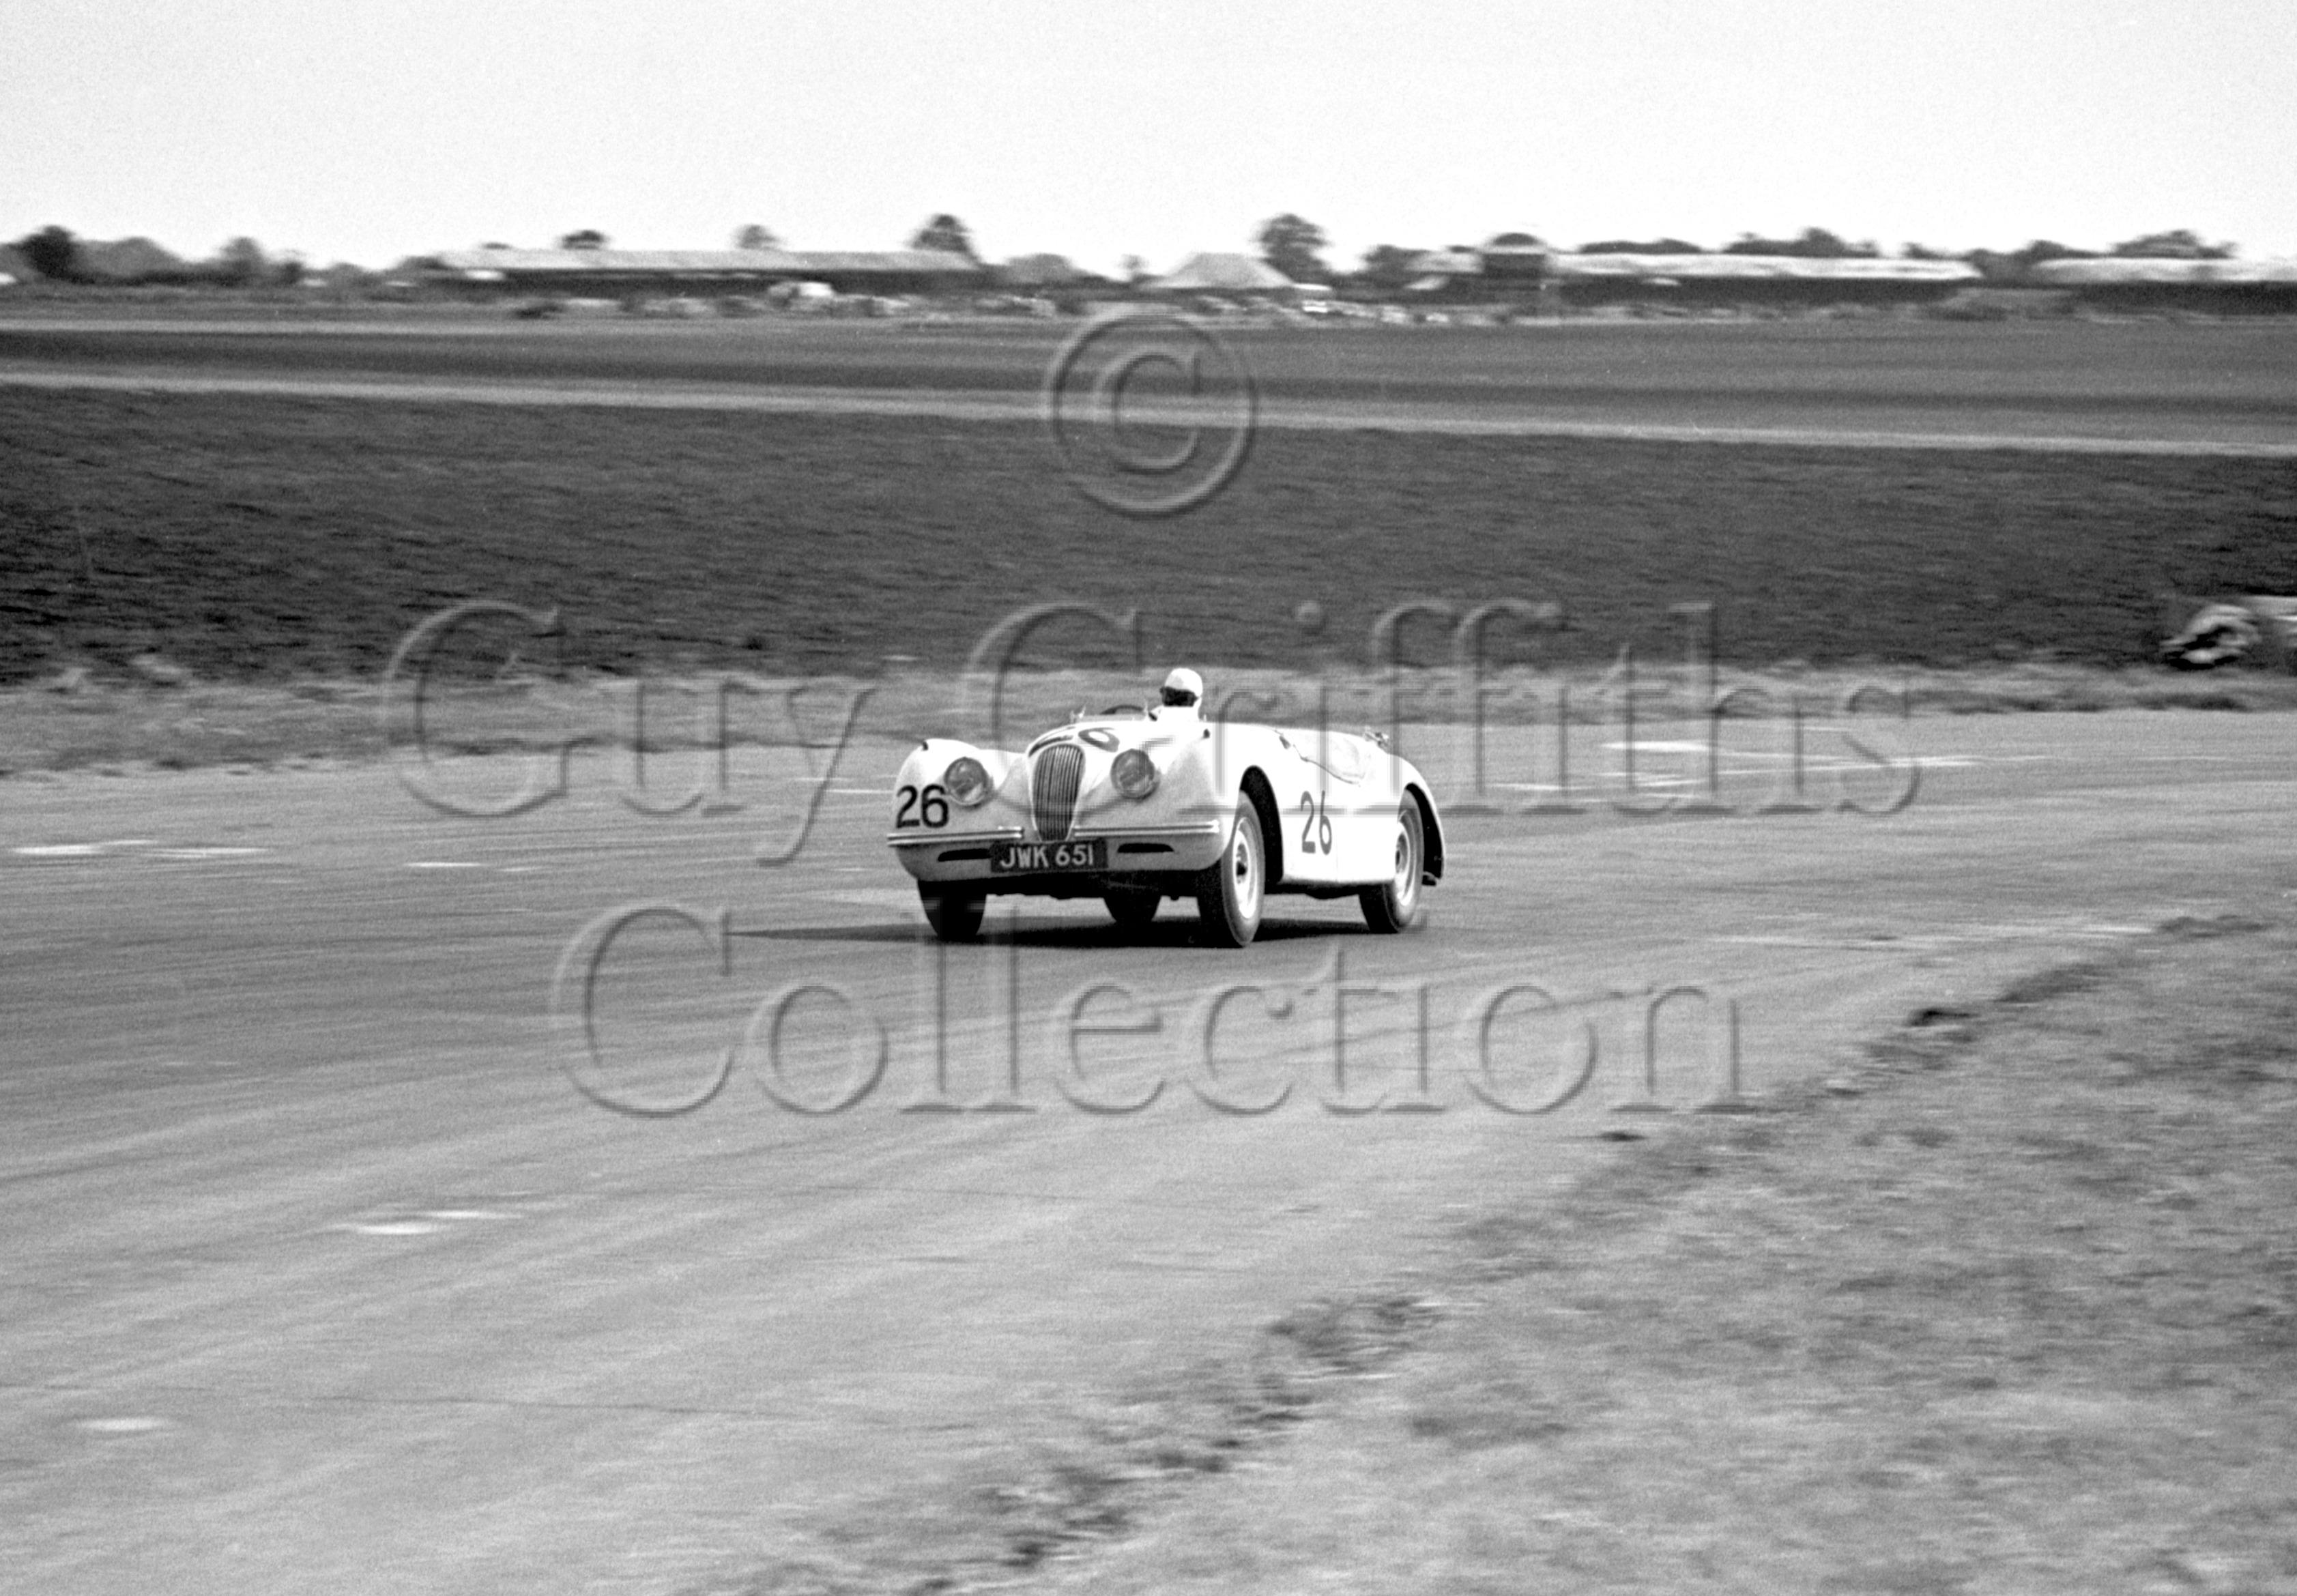 36-144–L-G-Johnson–Jaguar-XK-120-JWK-651–Silverstone–26-08-1950.jpg - Guy Griffiths Collection